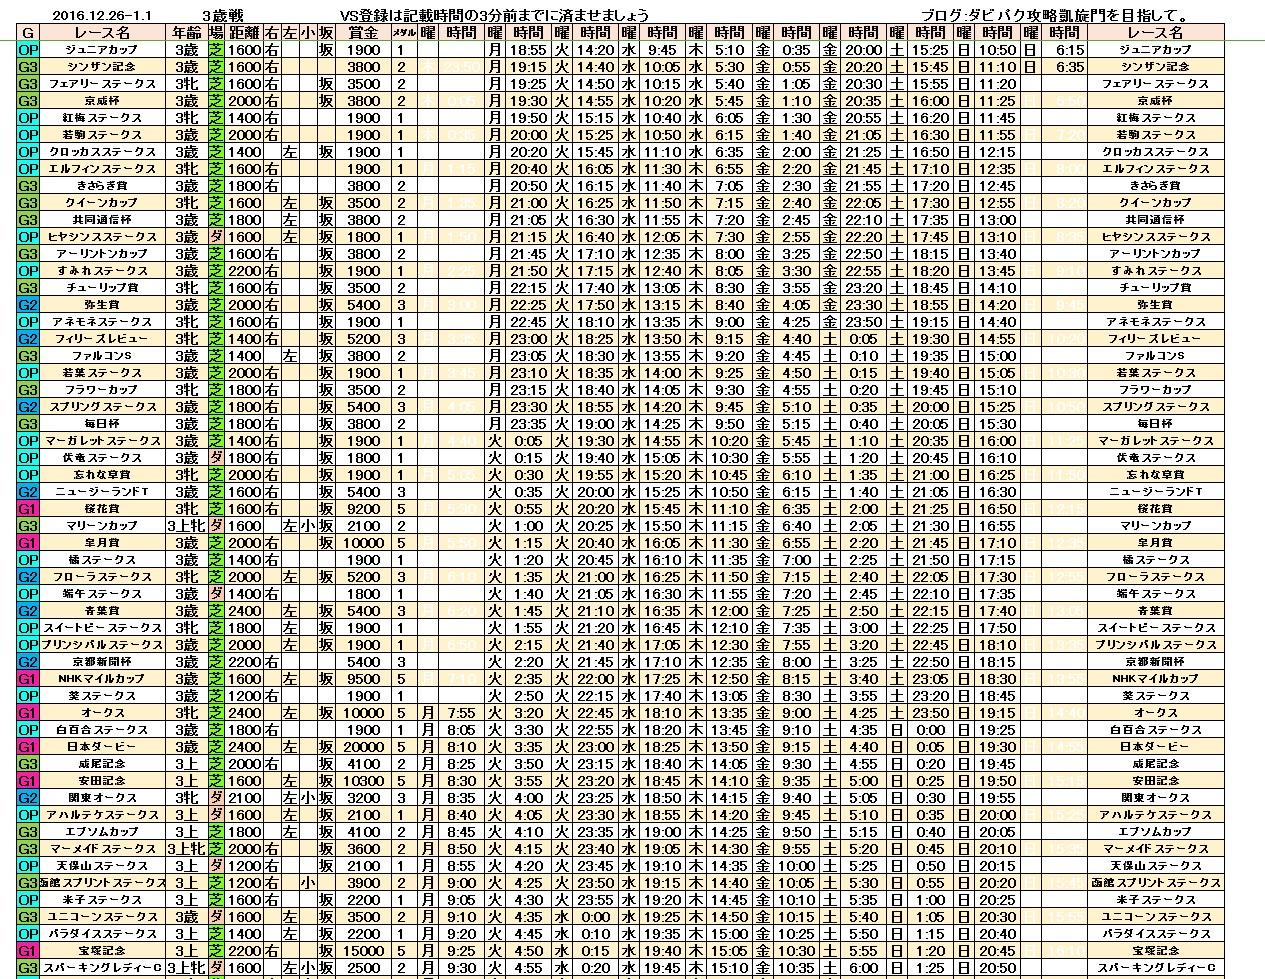 %e3%83%80%e3%83%bc%e3%83%93%e3%83%bc%e3%82%a4%e3%83%b3%e3%83%91%e3%82%af%e3%83%88vs%e3%83%ac%e3%83%bc%e3%82%b91226-4